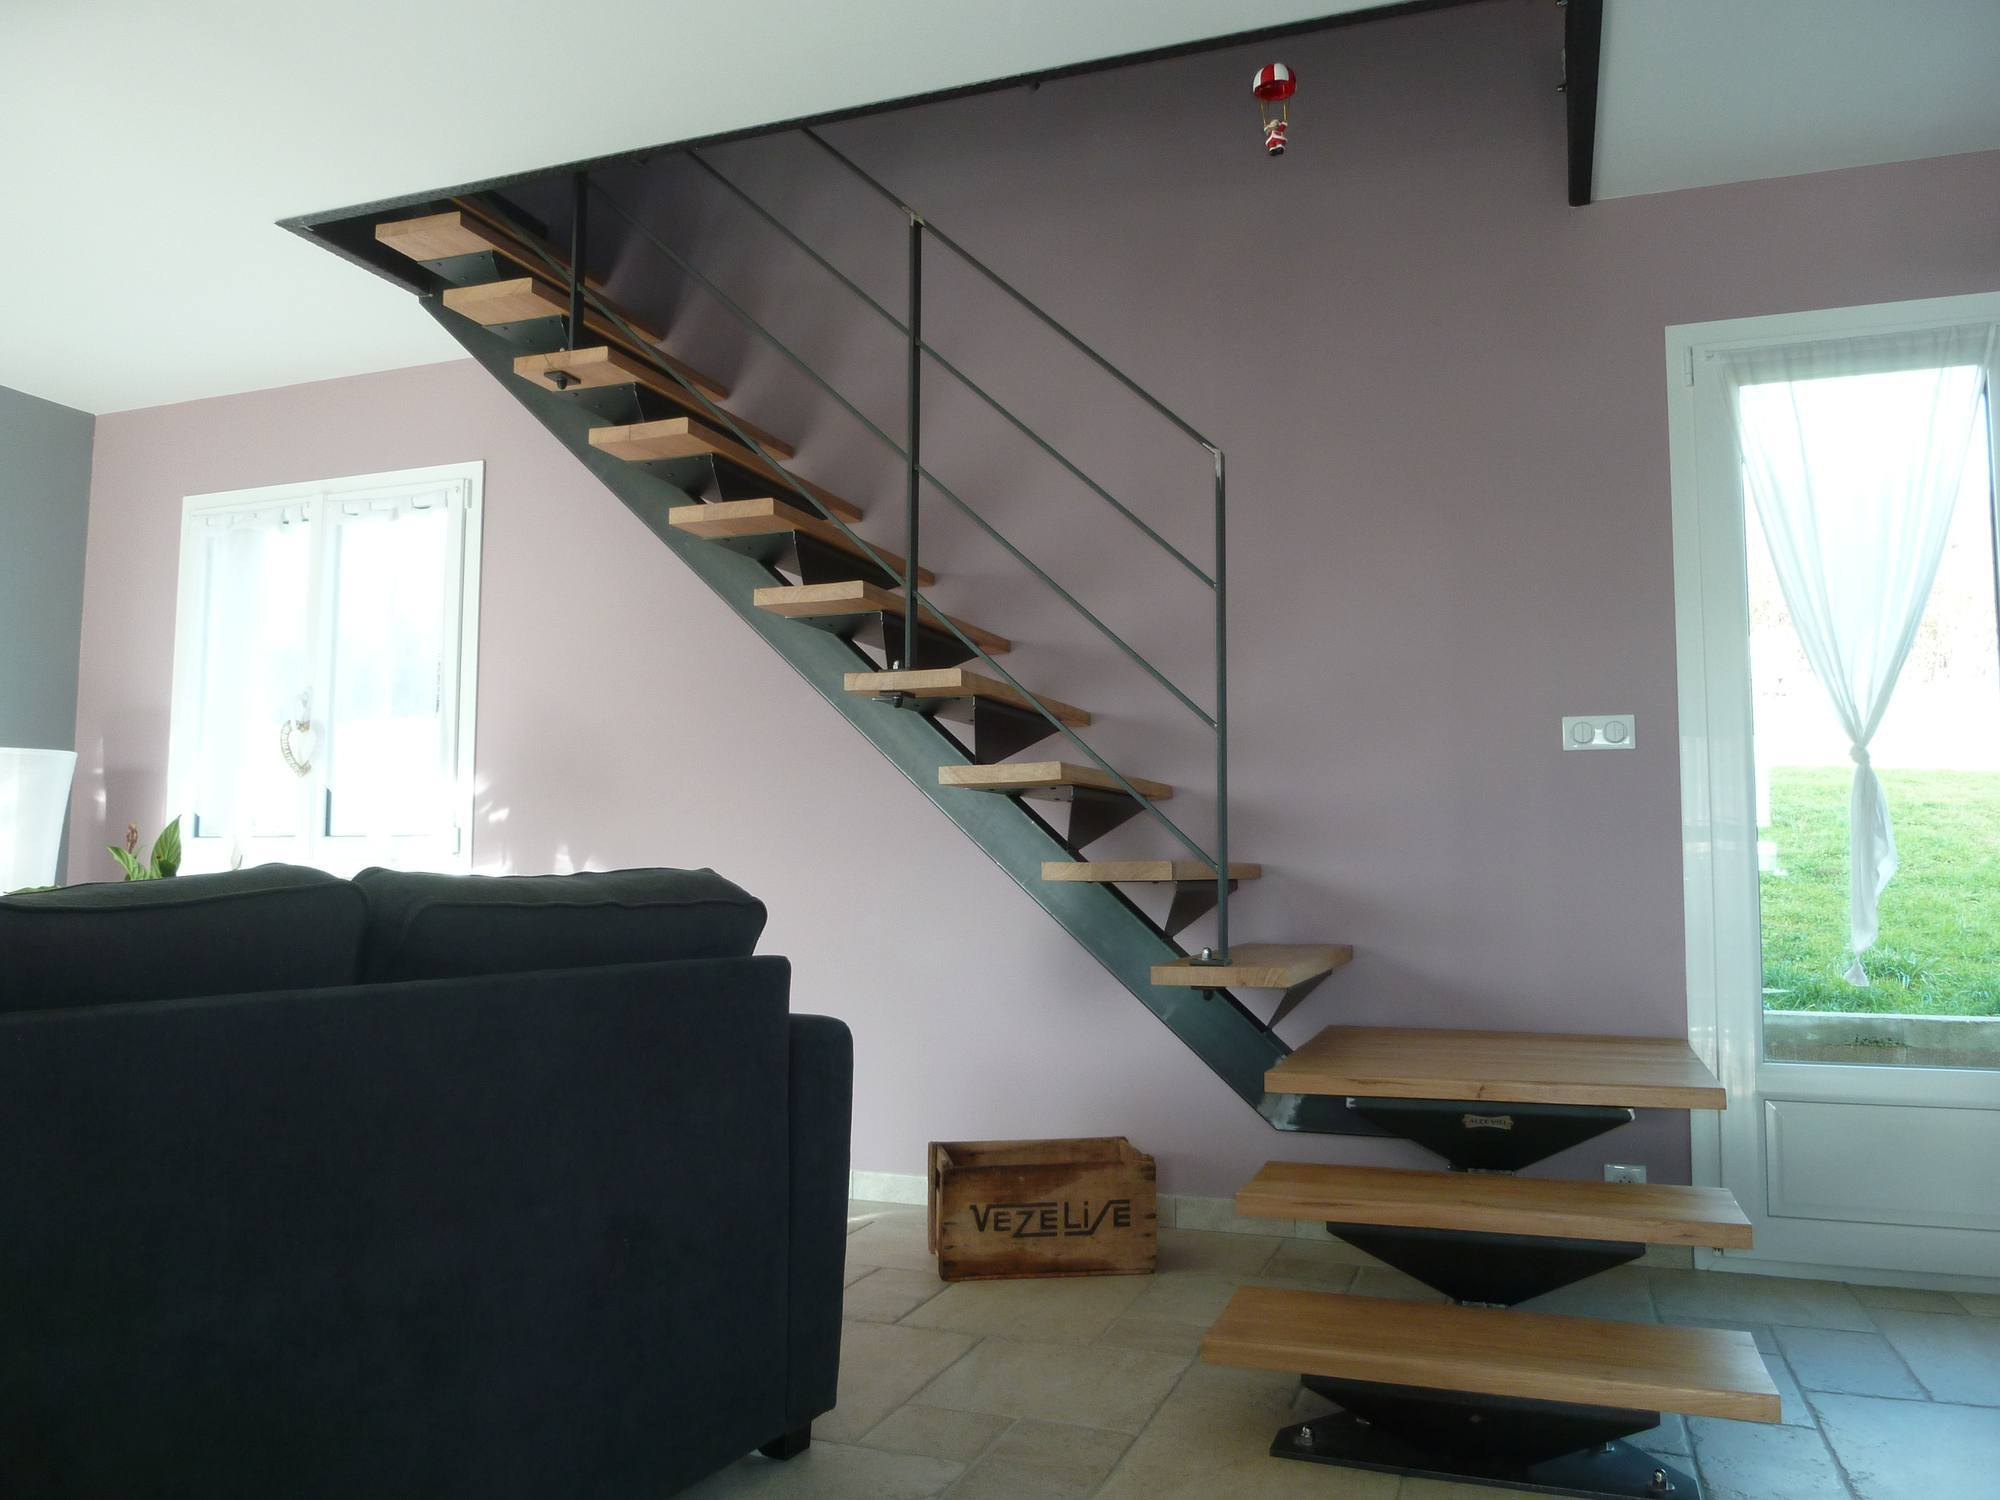 Escalier Acier Brut escalier en acier brut, effet industriel   alex viel